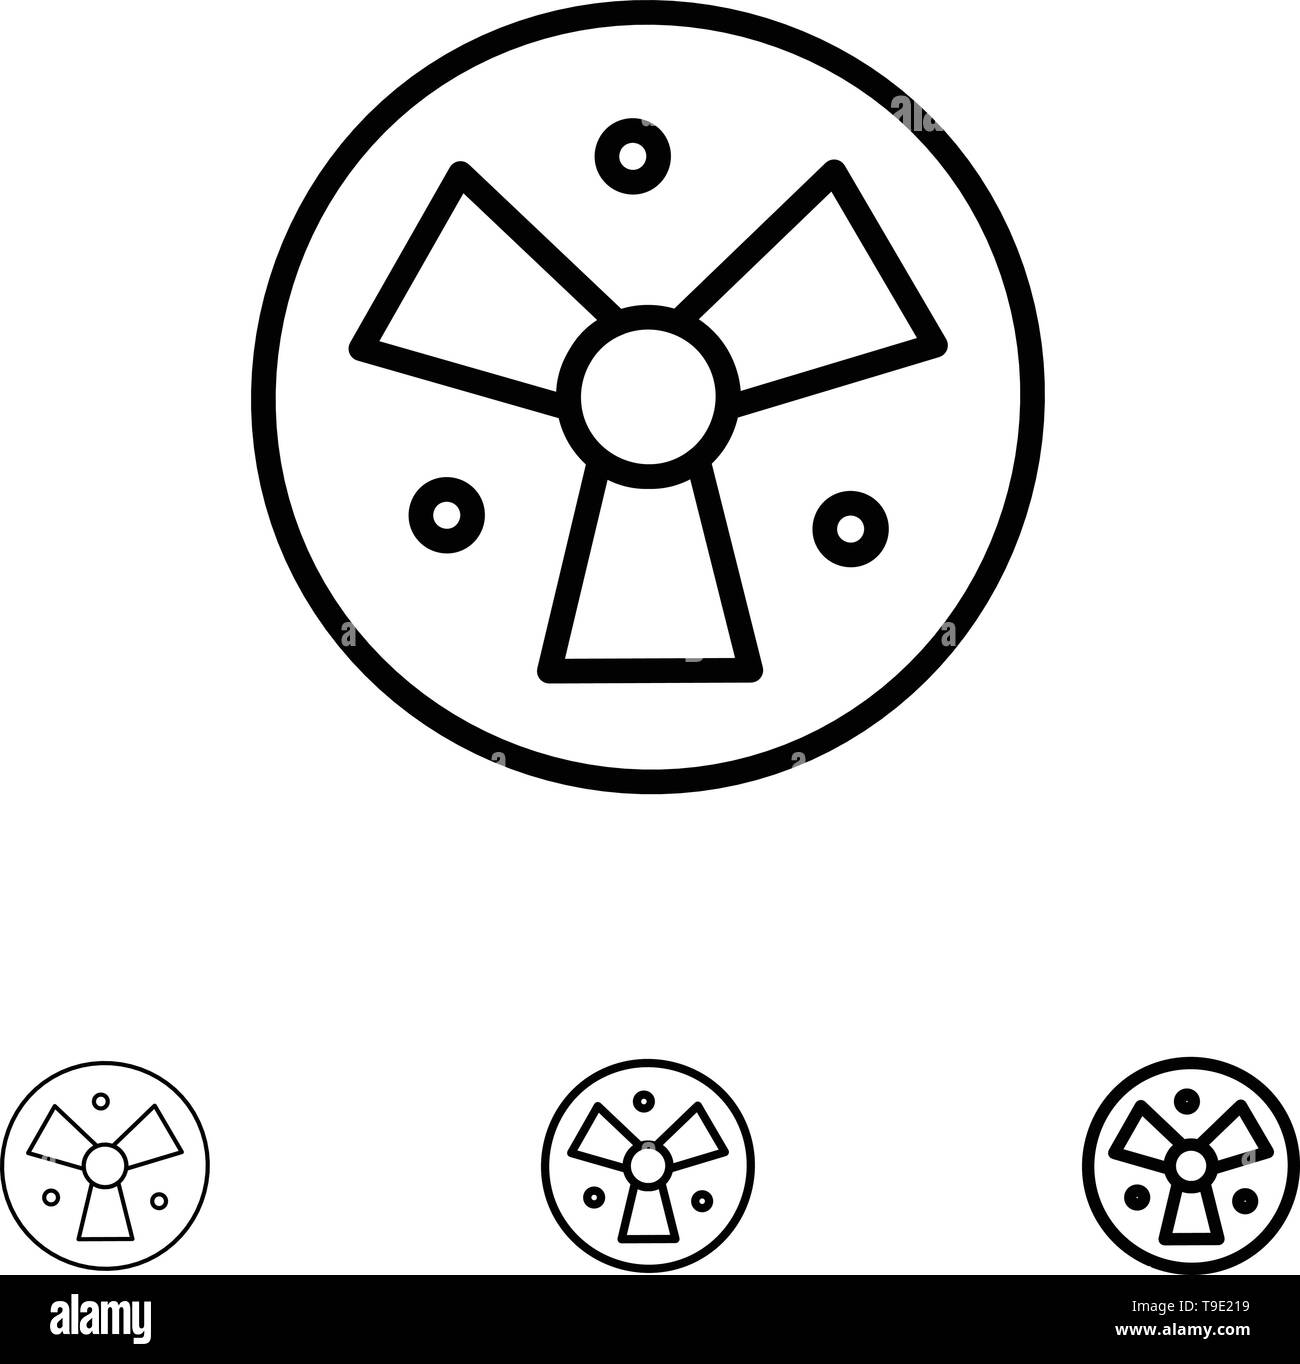 Radiation, Warning, Medical, Fan Bold and thin black line icon set - Stock Image